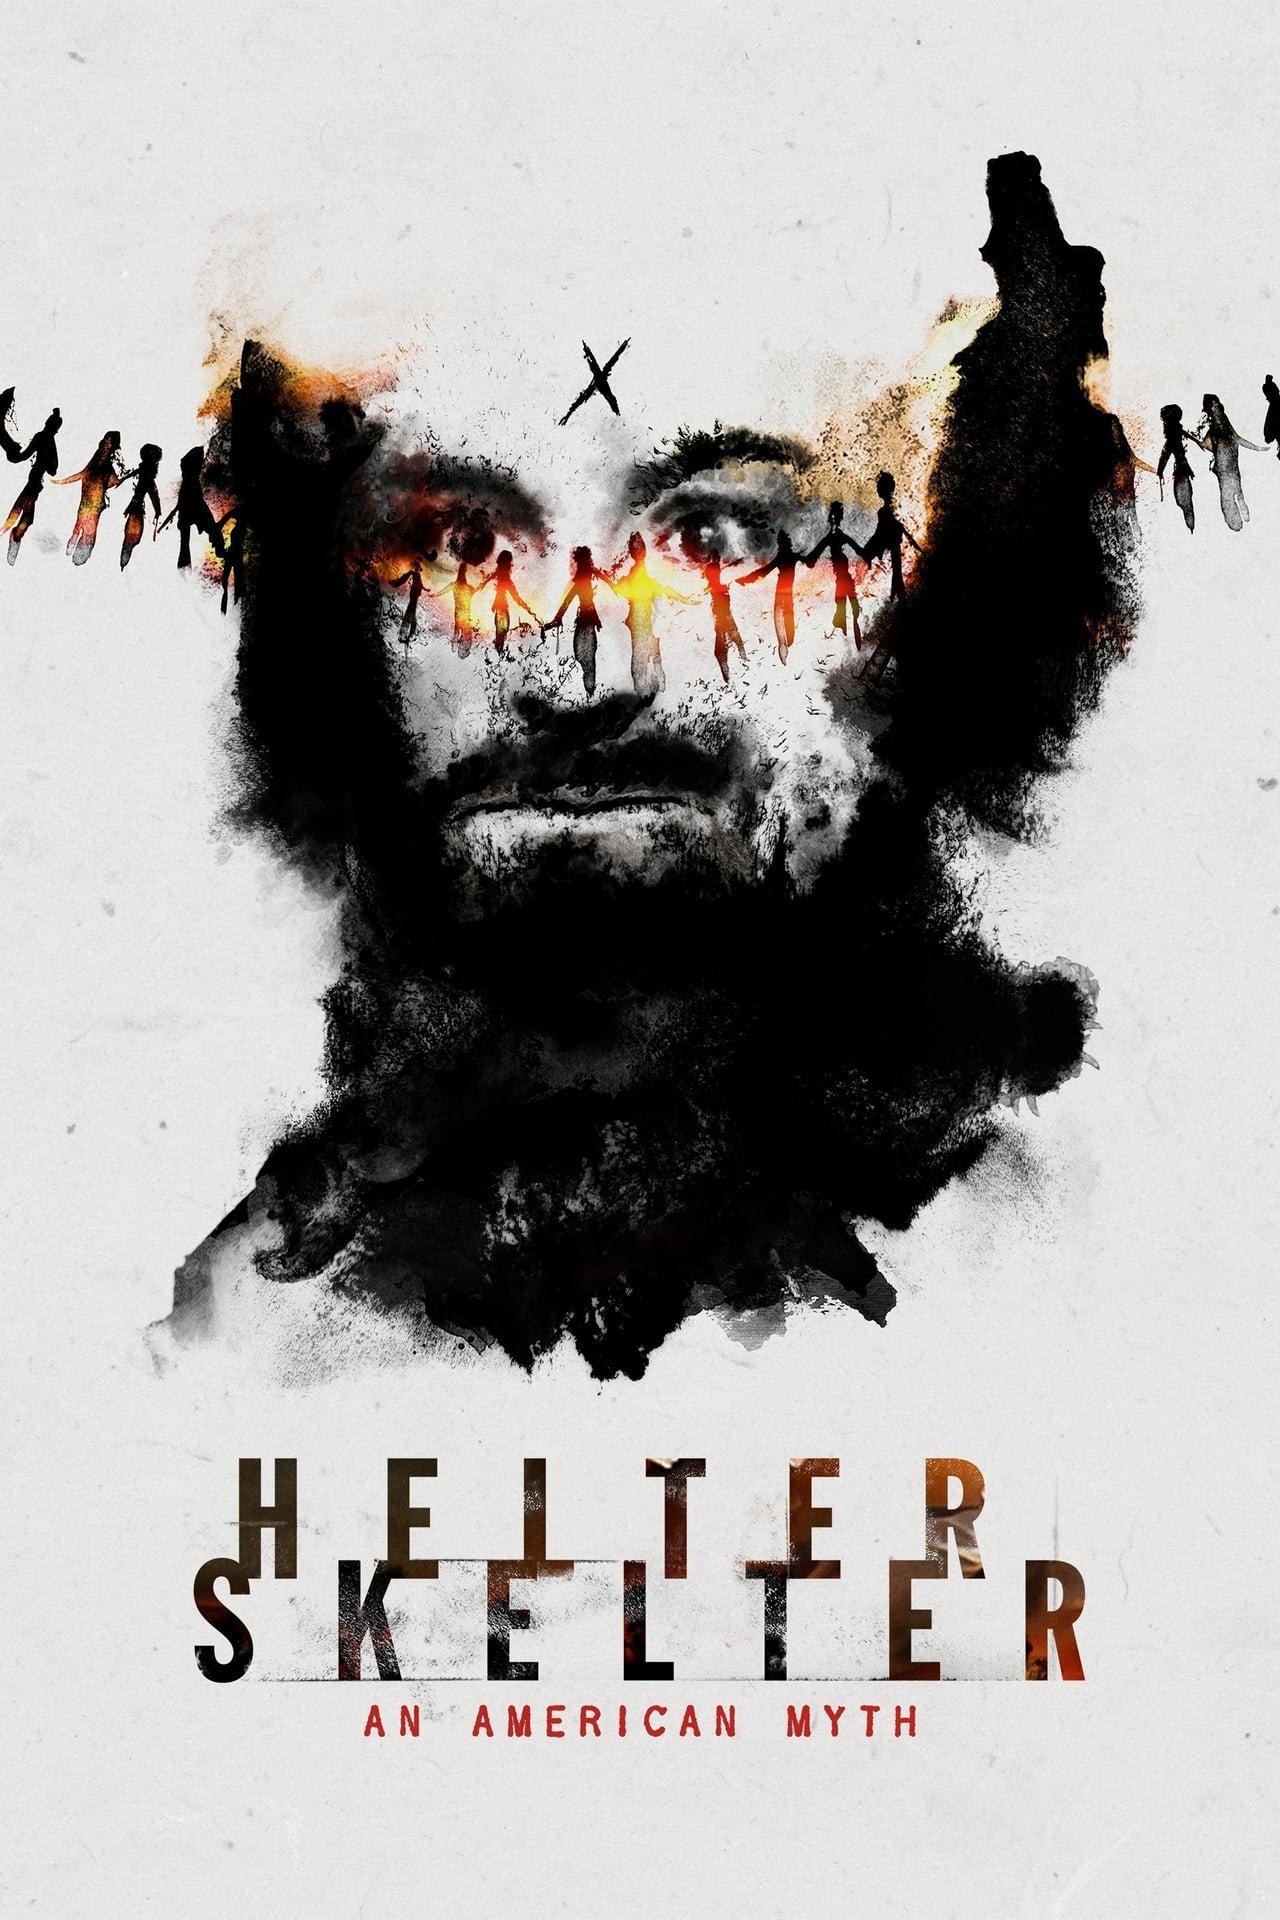 Serie Helter Skelter Season 1 on Soap2day online